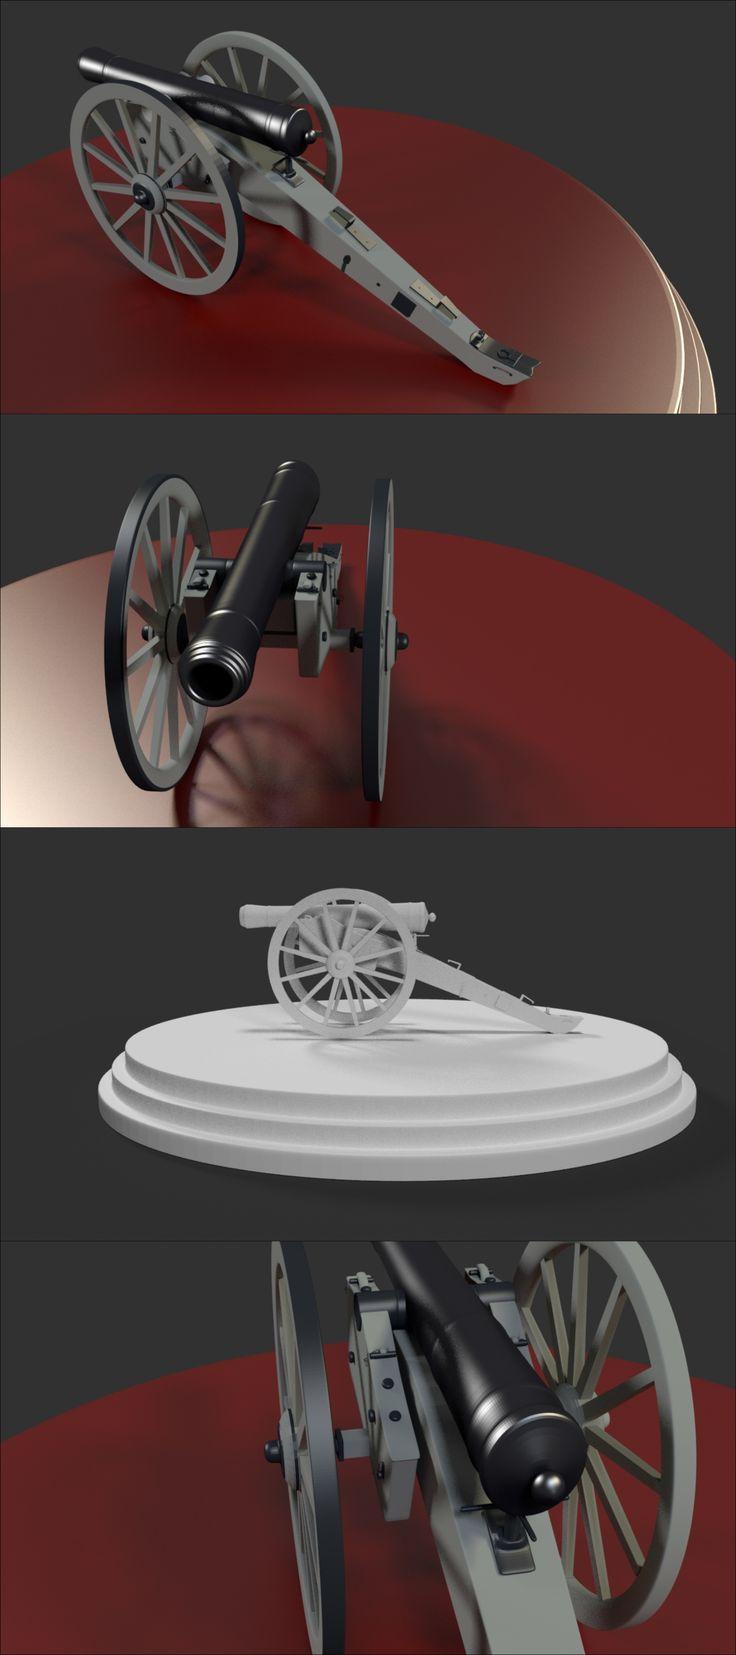 #3d model of #cannon artillery  #weapon made using #blender3d https://www.youtube.com/watch?v=rvfFr8vJEv8